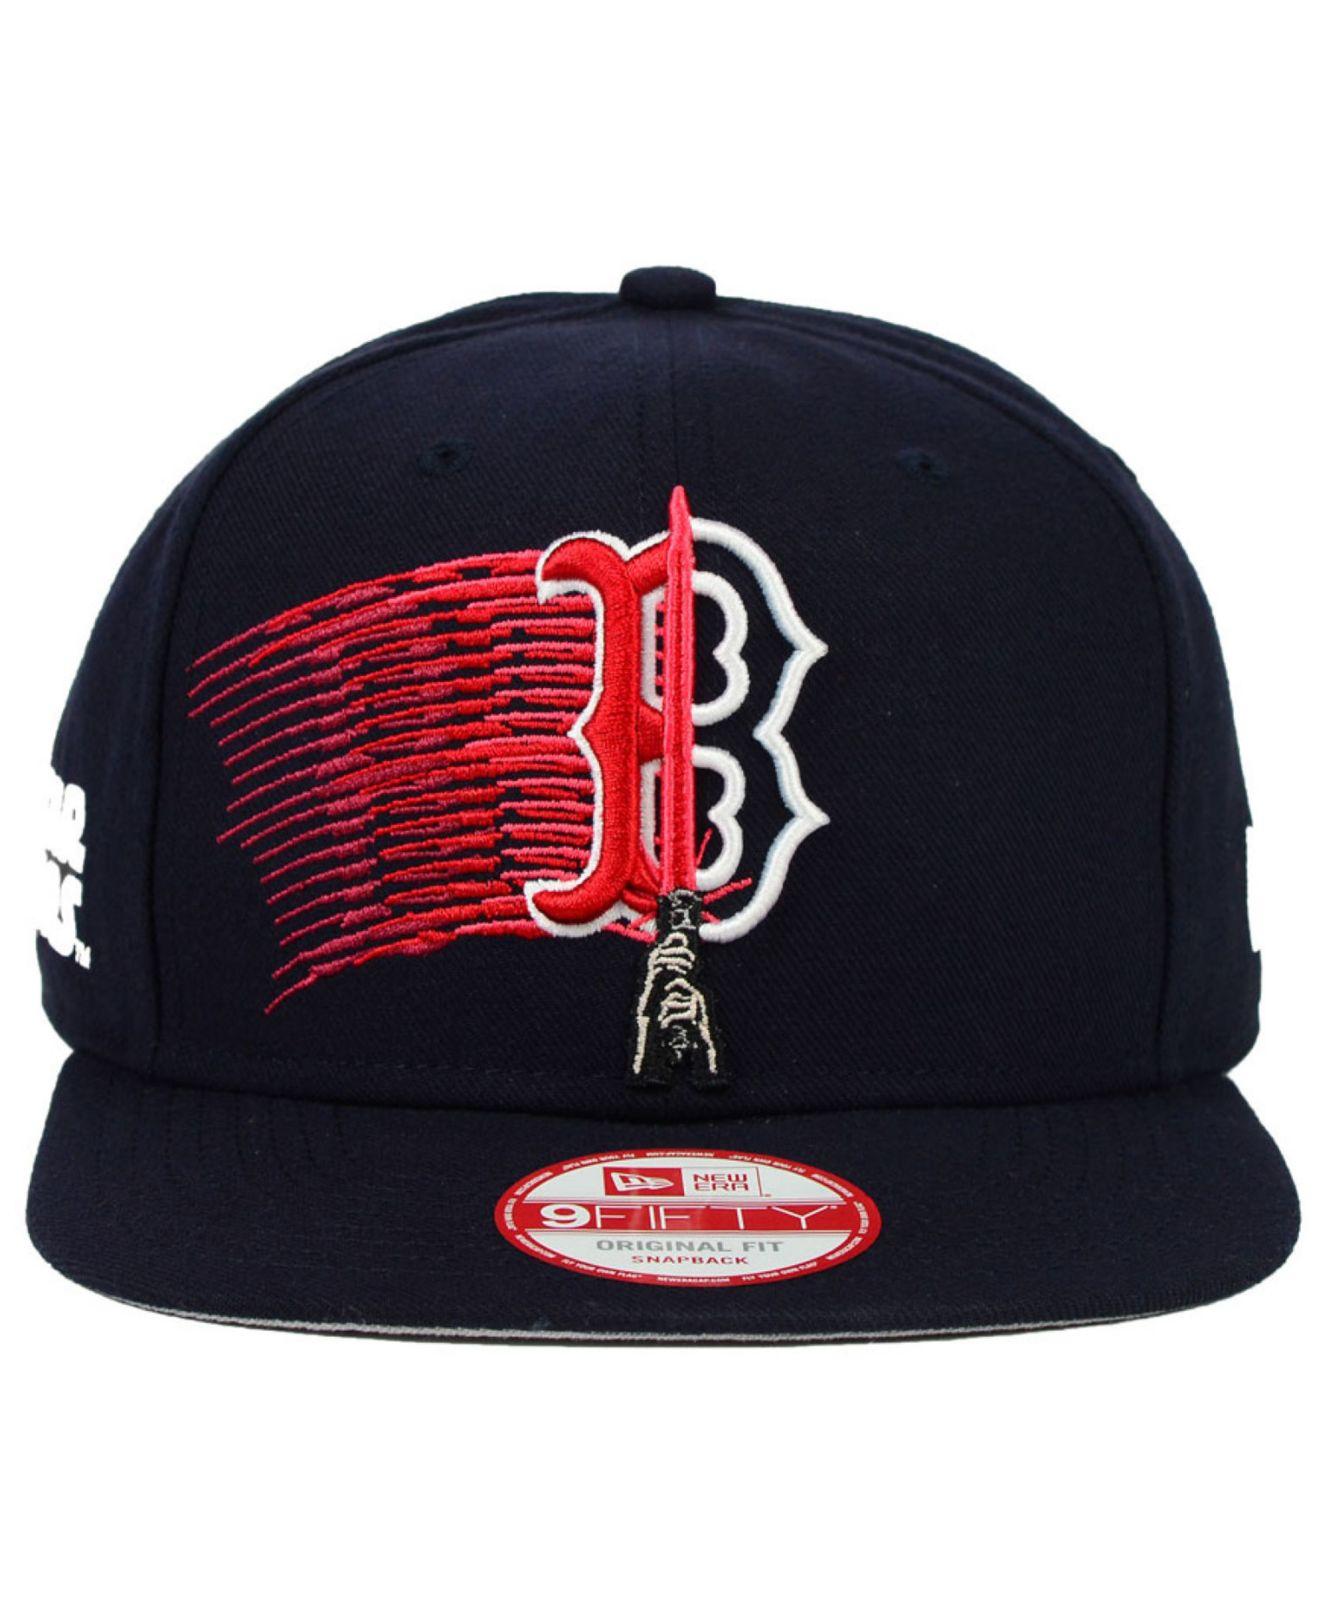 buy popular e5657 be948 new style boston red sox bobble hat hat 85d58 2da4d